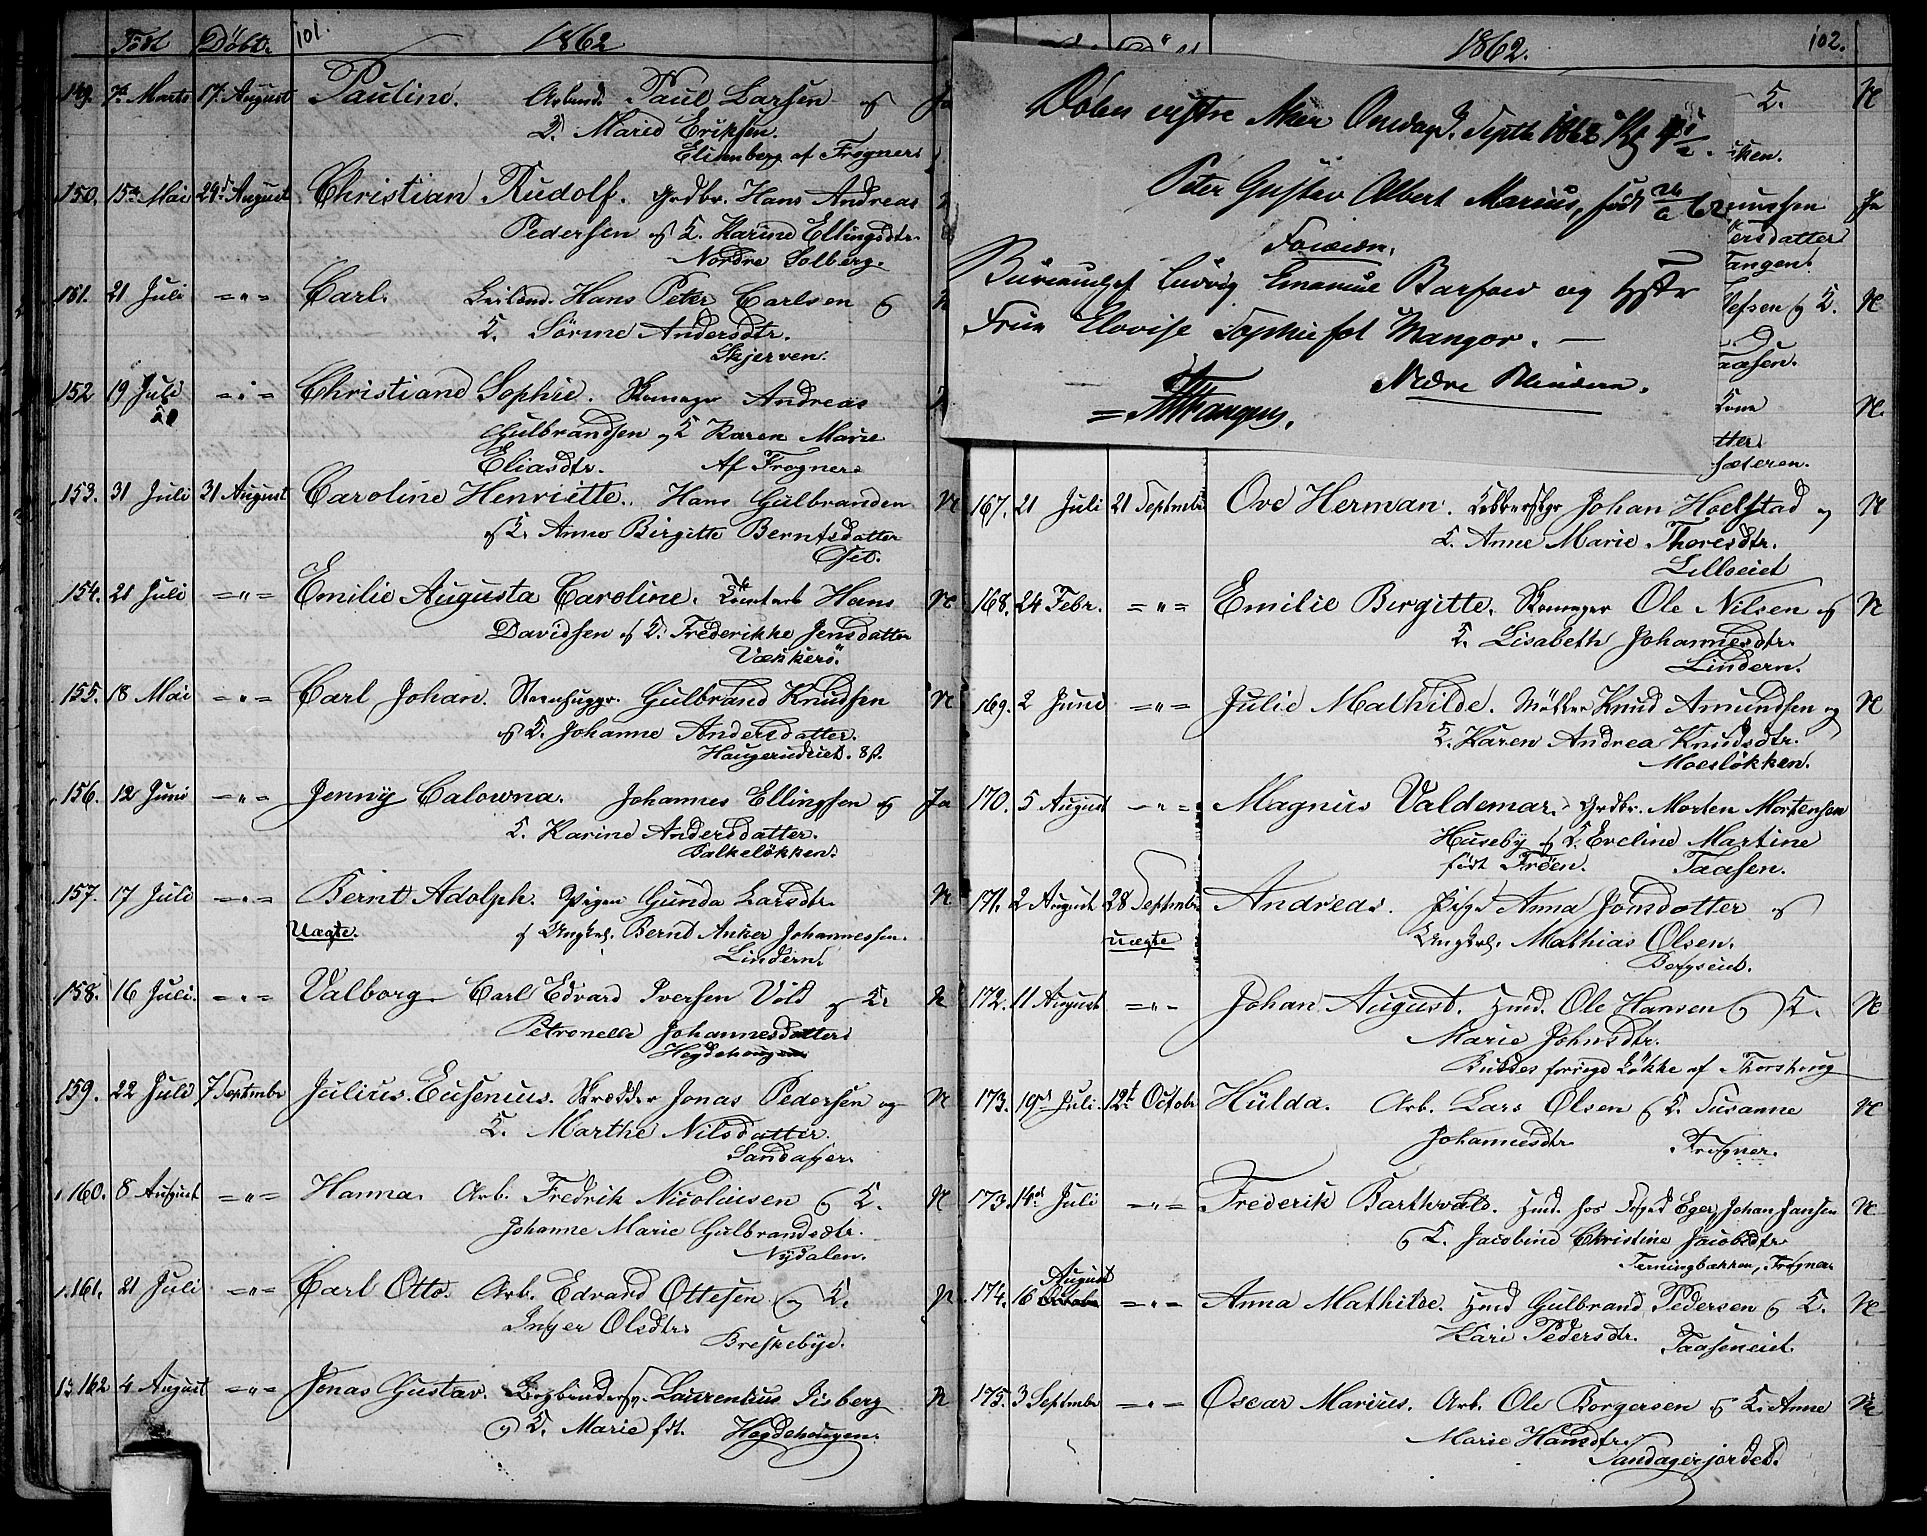 SAO, Vestre Aker prestekontor Kirkebøker, G/Ga/L0001: Klokkerbok nr. I 1, 1859-1871, s. 101-102